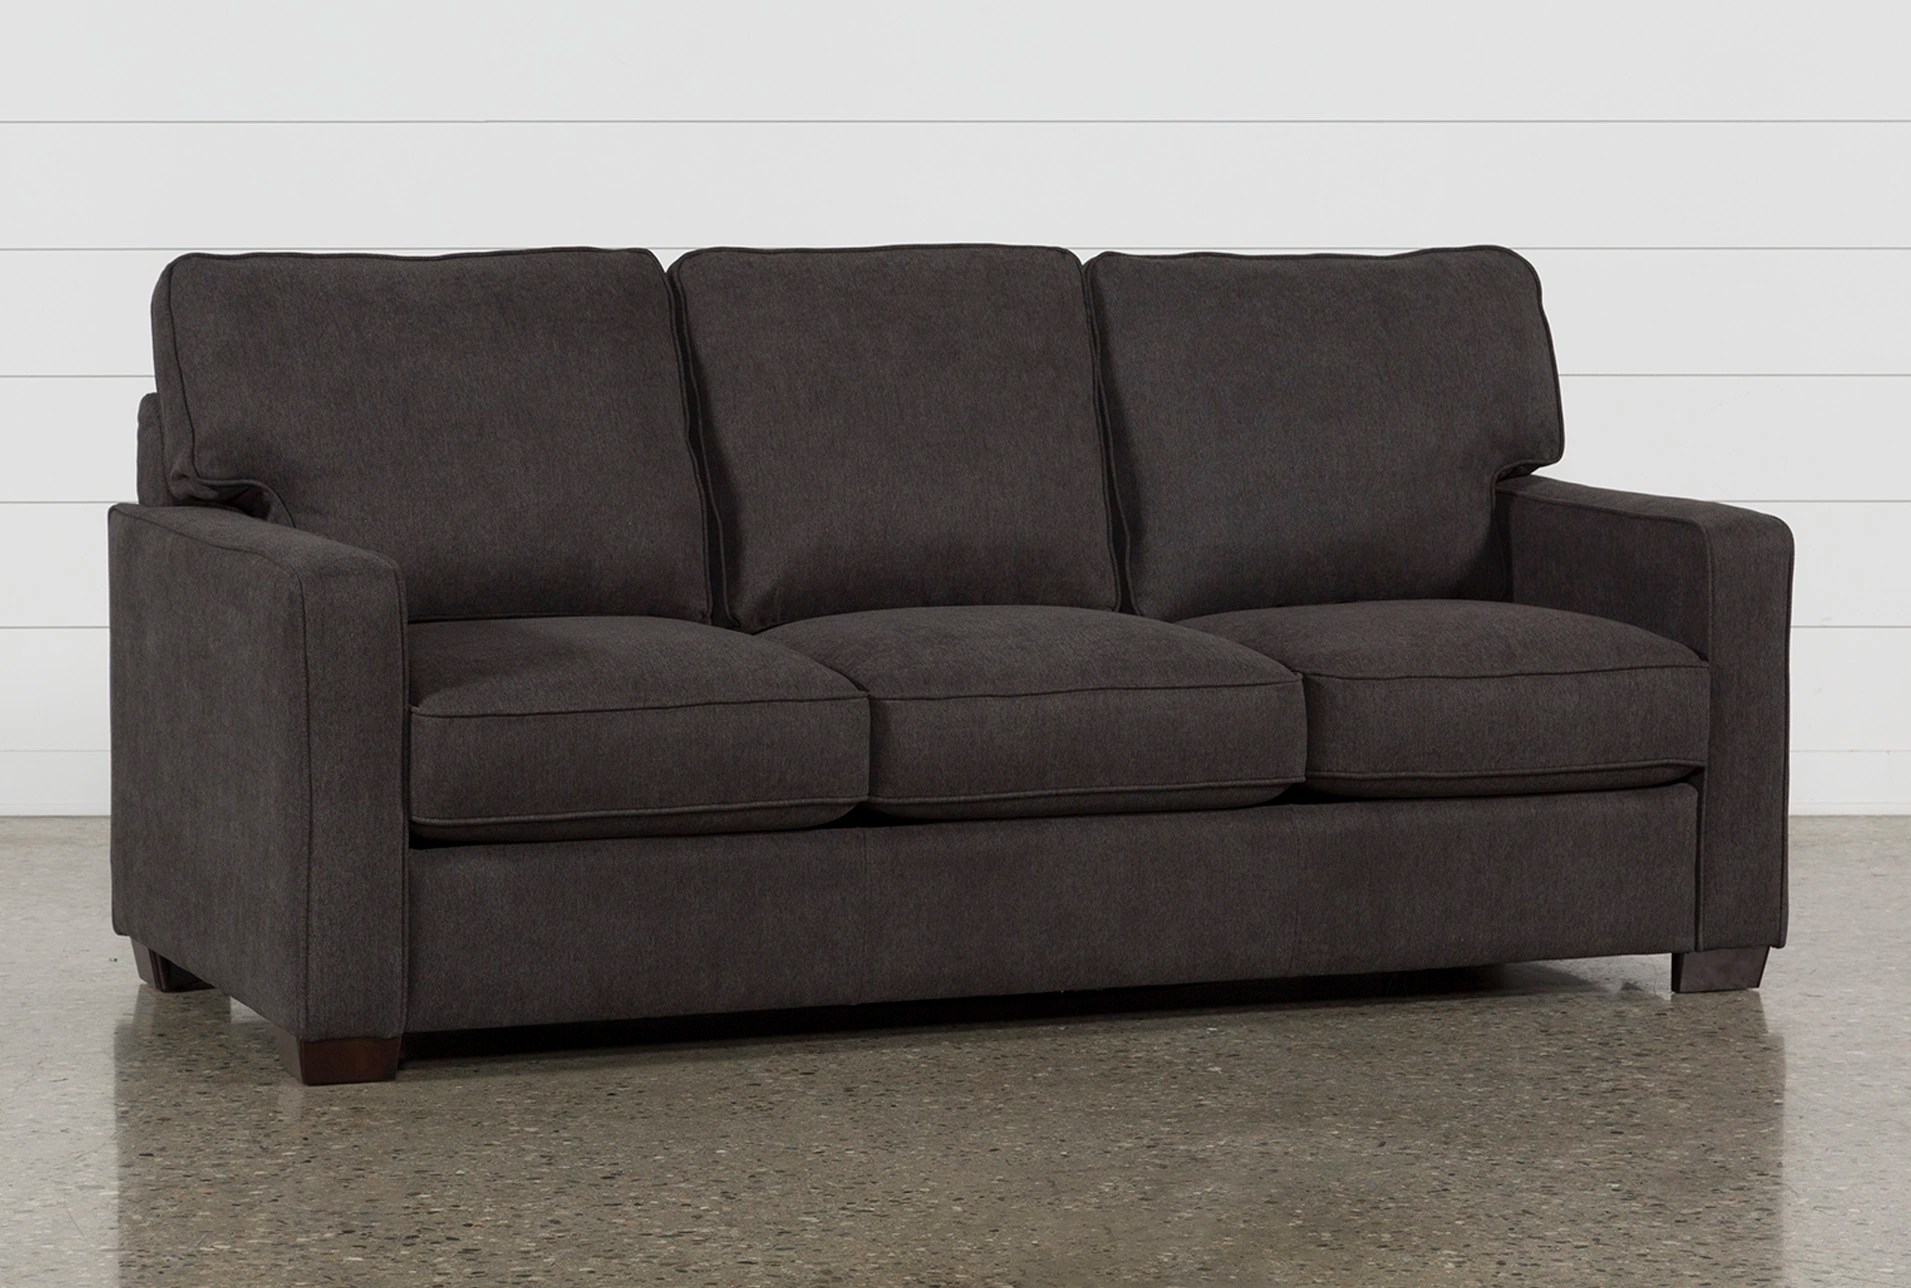 loft charcoal sofa bed kensington luxury multi storage morris queen sleeper living spaces